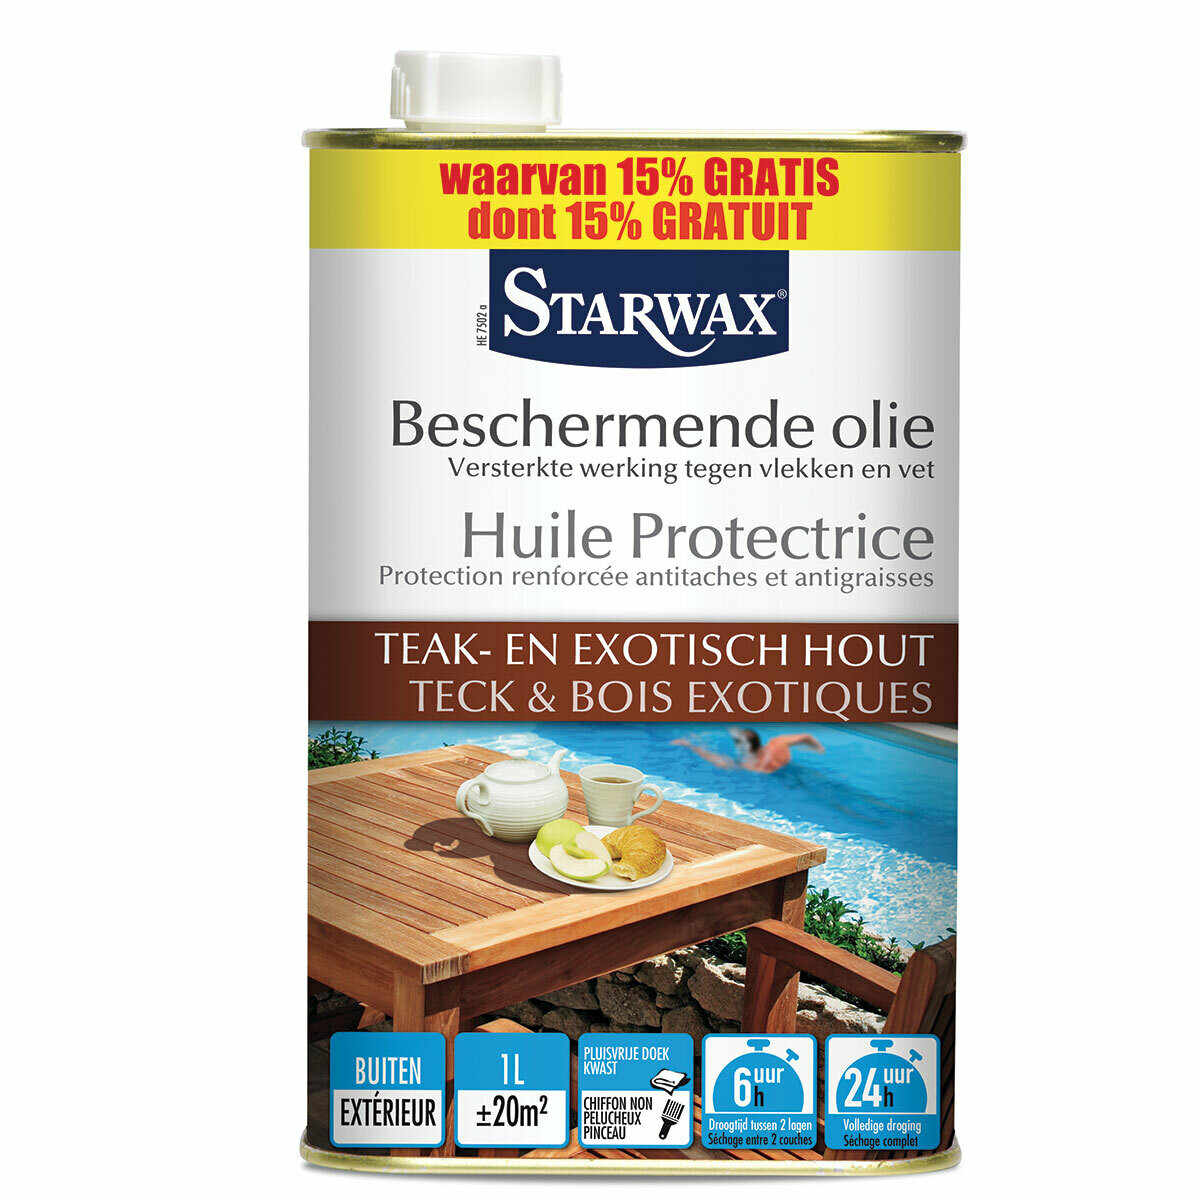 Starwax Beschermende olie Teak en Exotisch hout 1 L